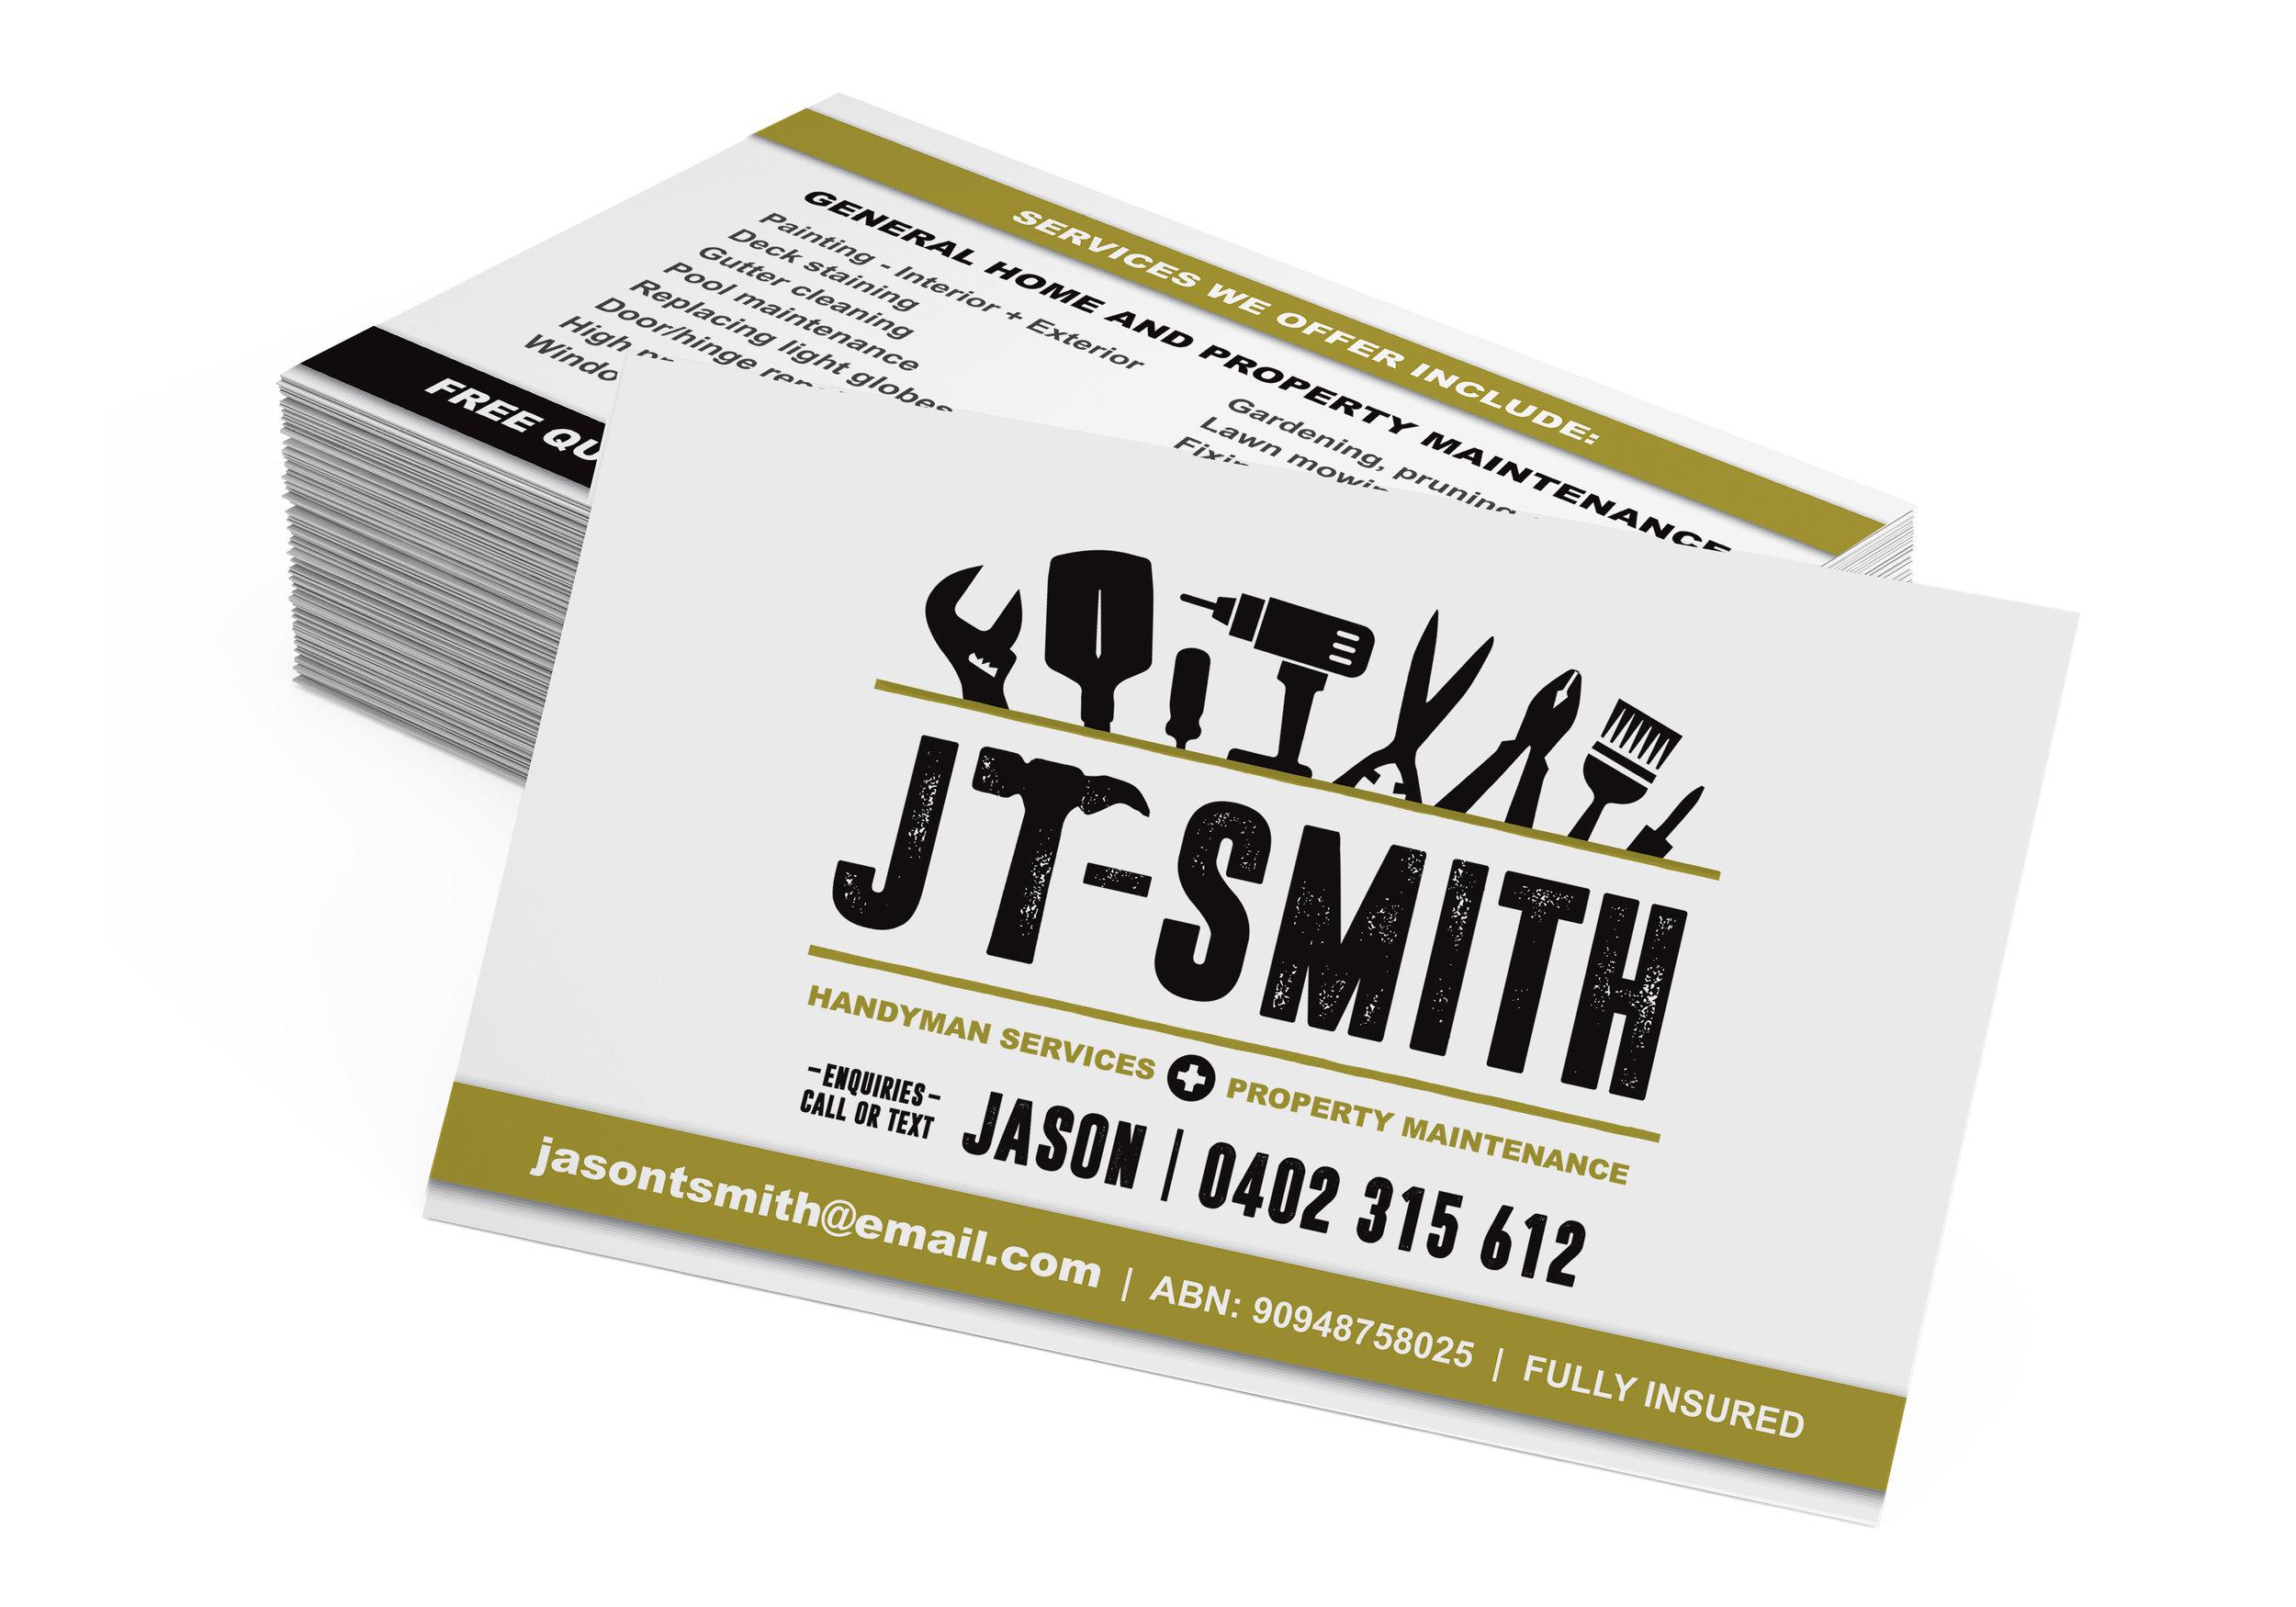 JT-SMITH HANDYMAN  : BRAND IDENTITY + GRAPHIC DESIGN